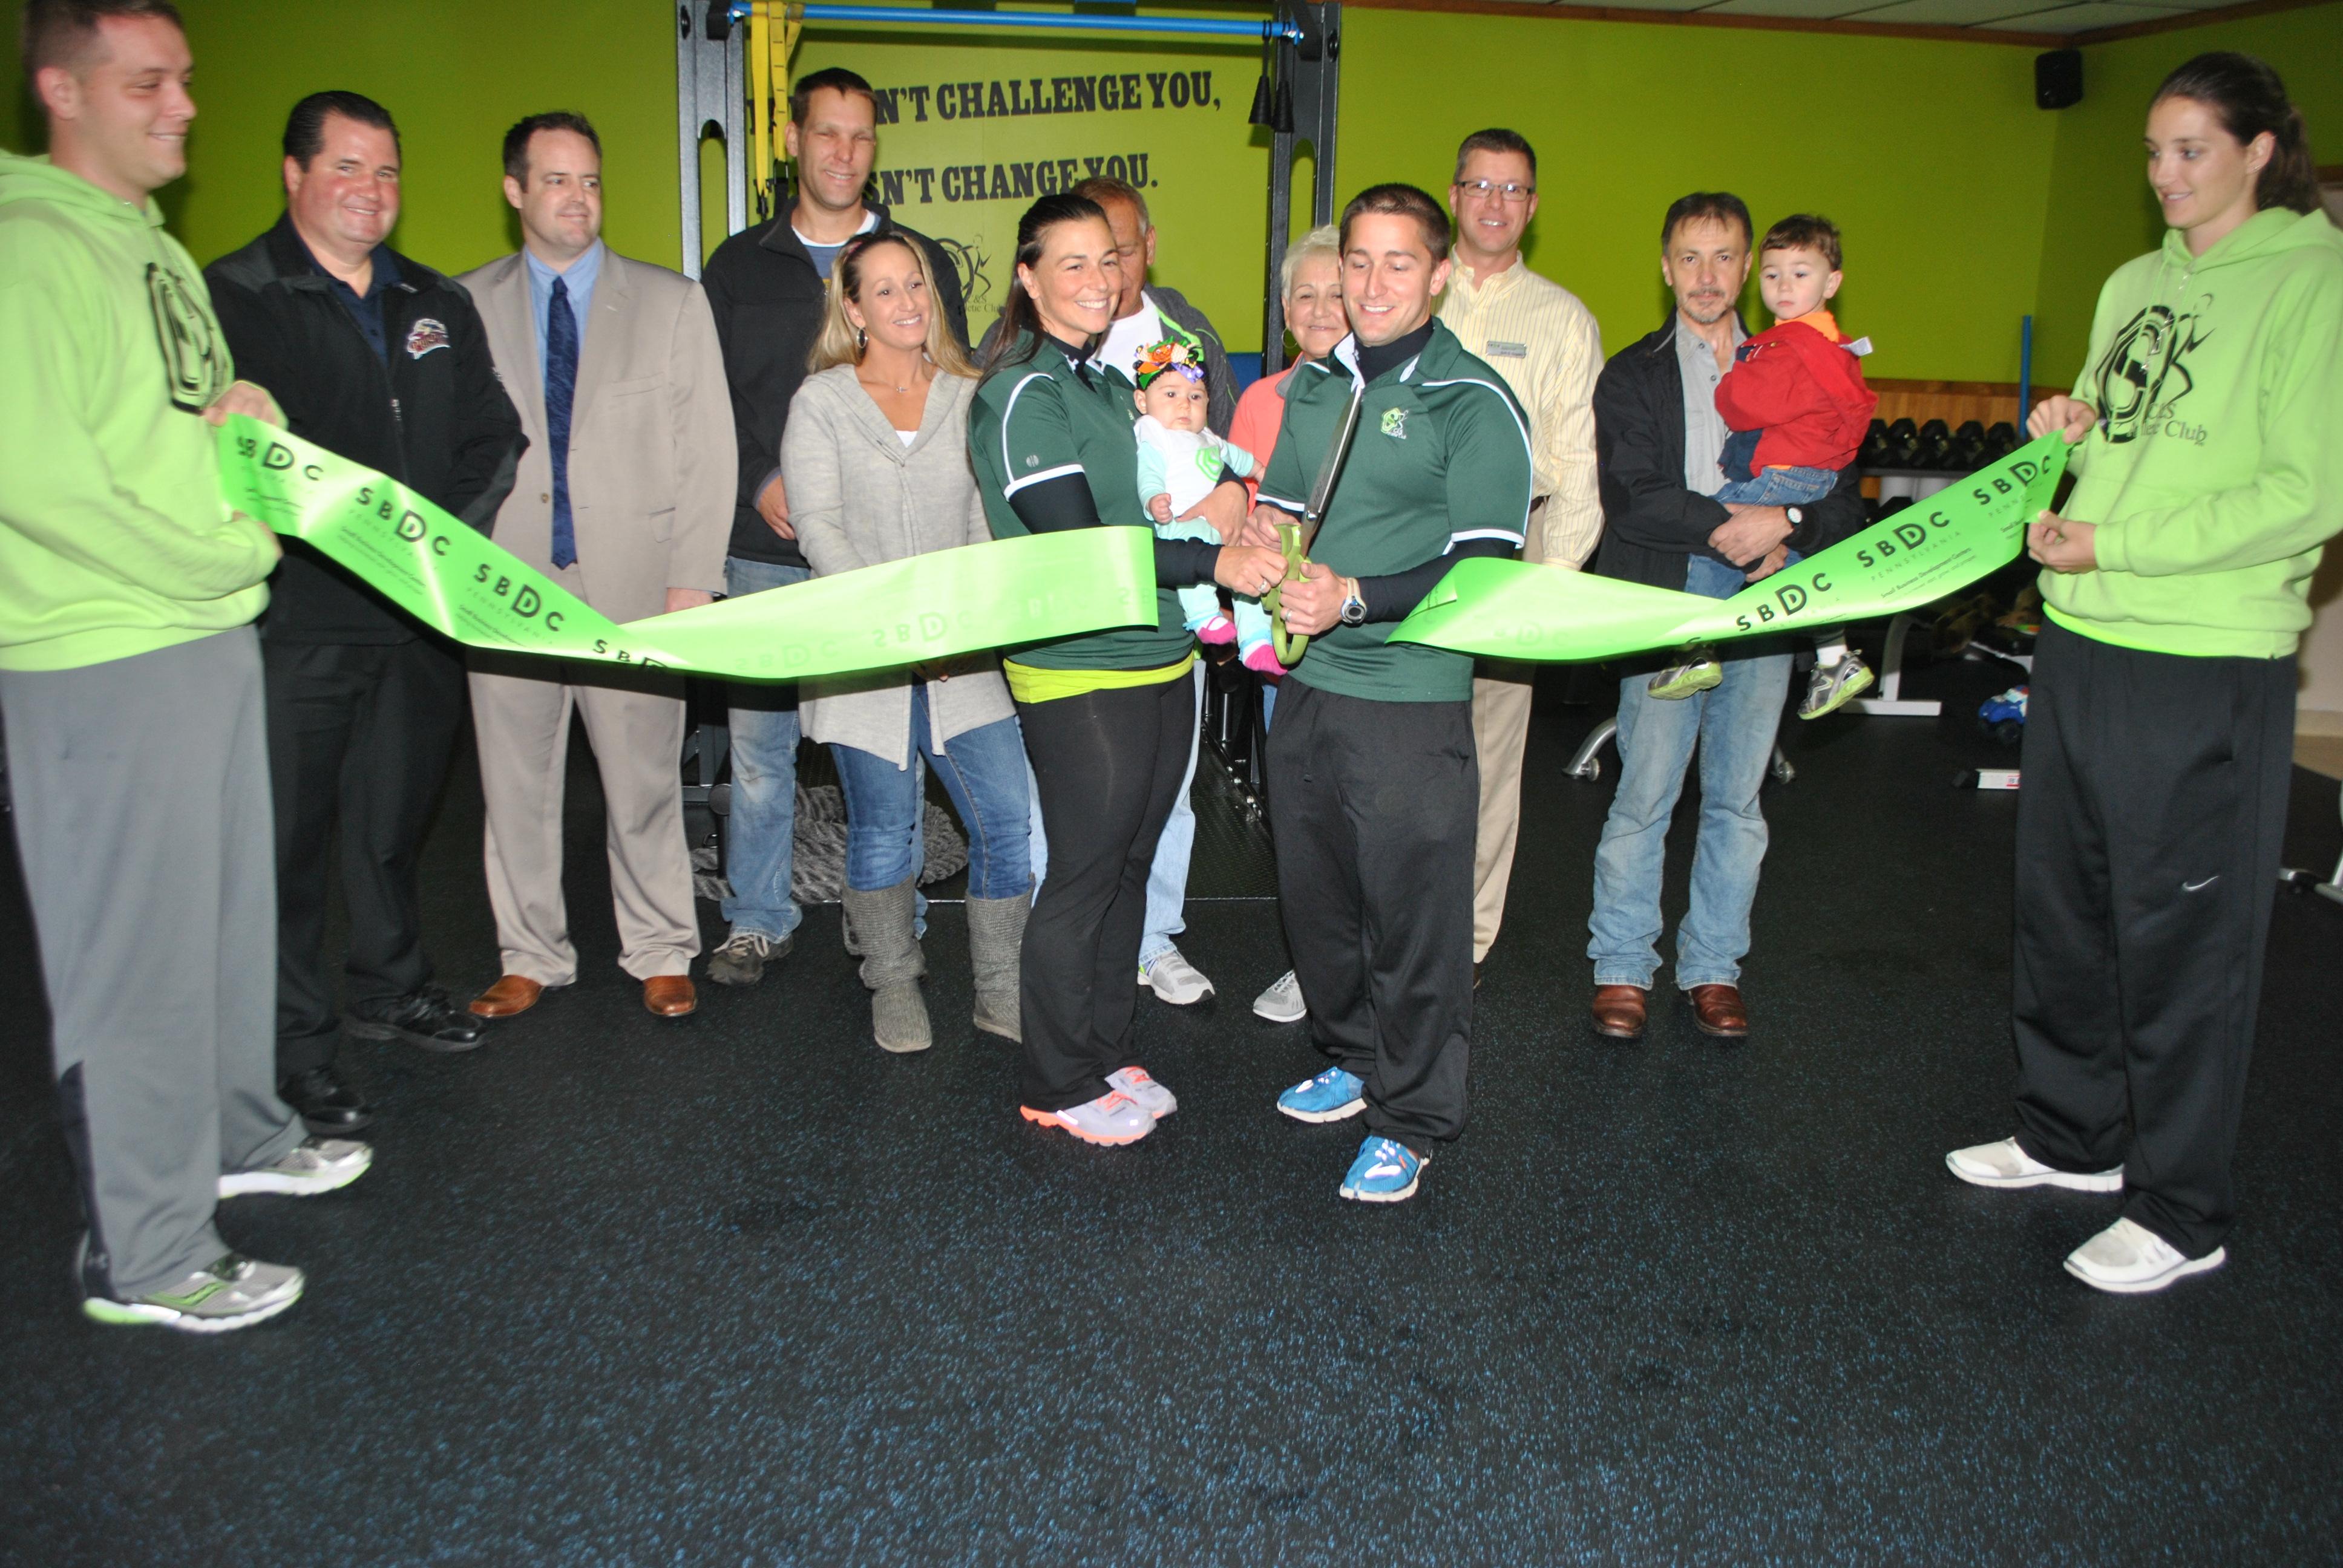 New Business Alert – C&S Athletic Club, LLC – Moosic, PA